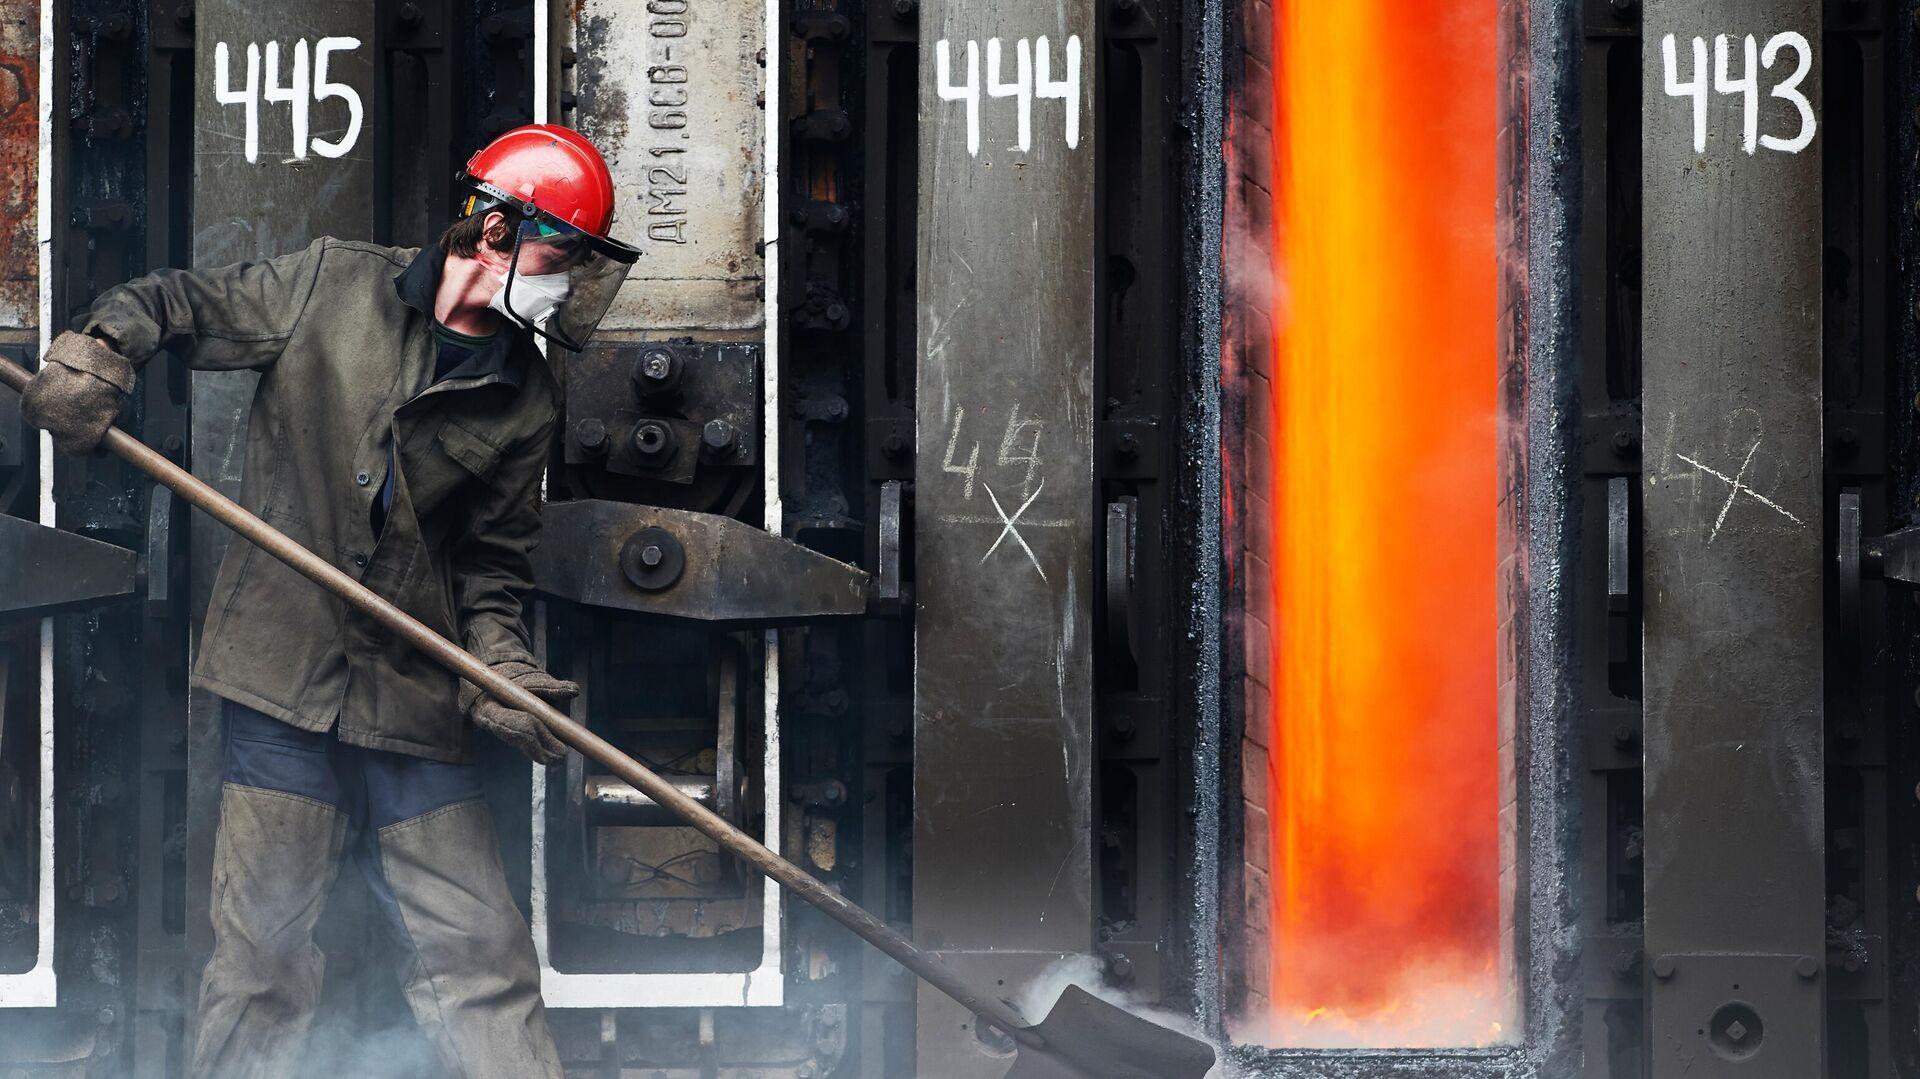 Рабочий у коксовой батареи  - РИА Новости, 1920, 07.04.2021